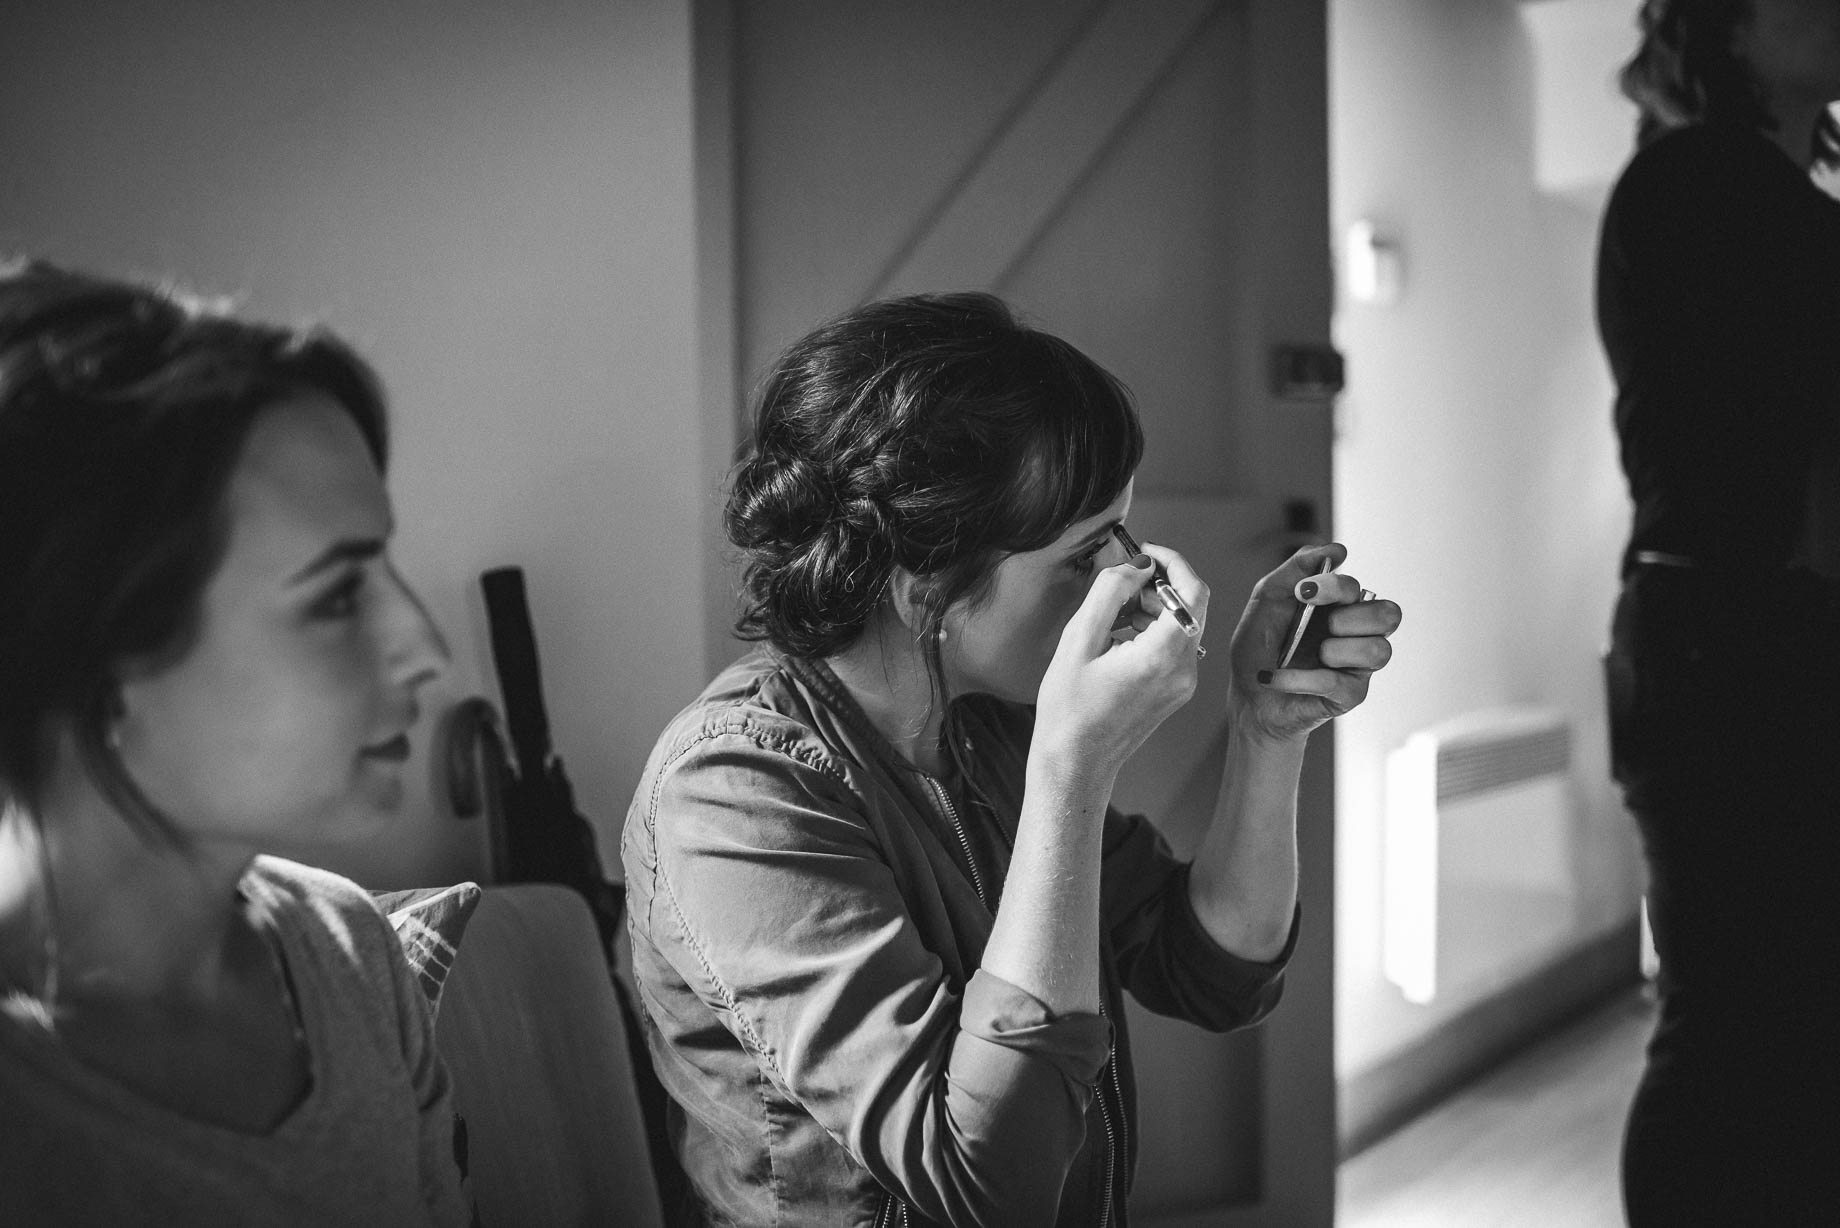 Gaynes Park wedding photography - Guy Collier Photography - Rachel and Jon (28 of 169)